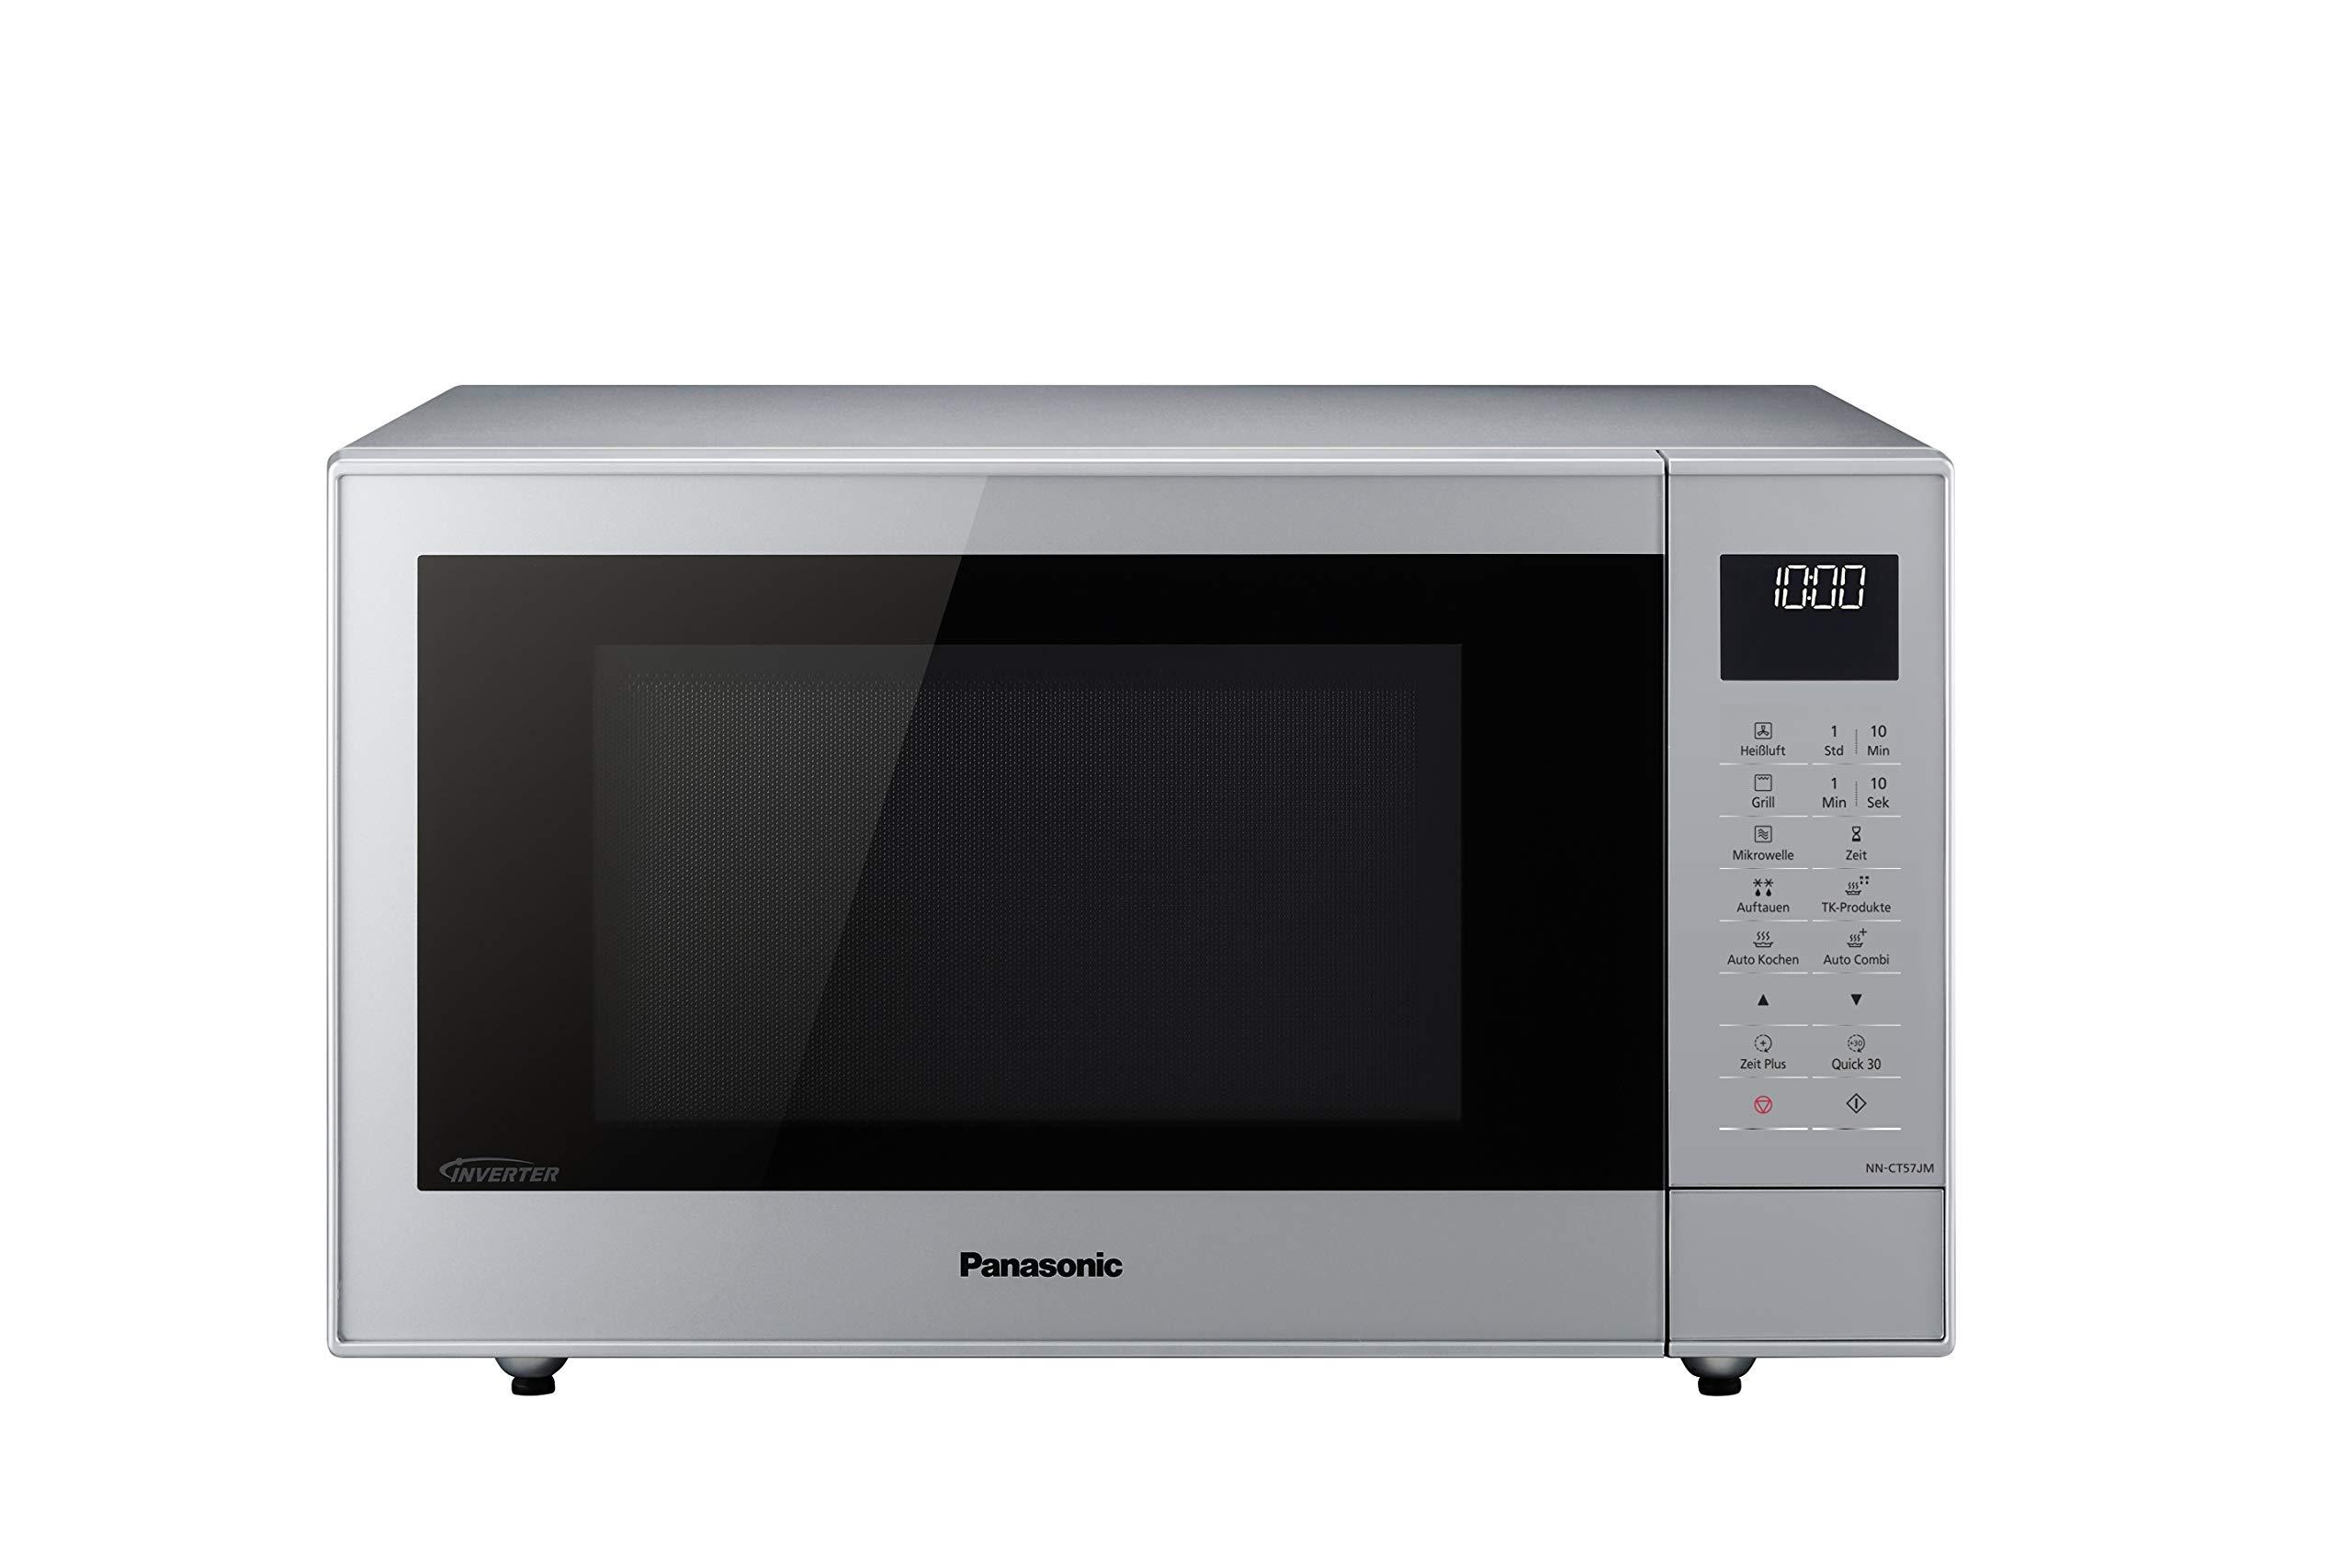 Panasonic NN-CT57 Mikrowellen-Grill mit Heißluft (1000 Watt, 27 Liter) silber